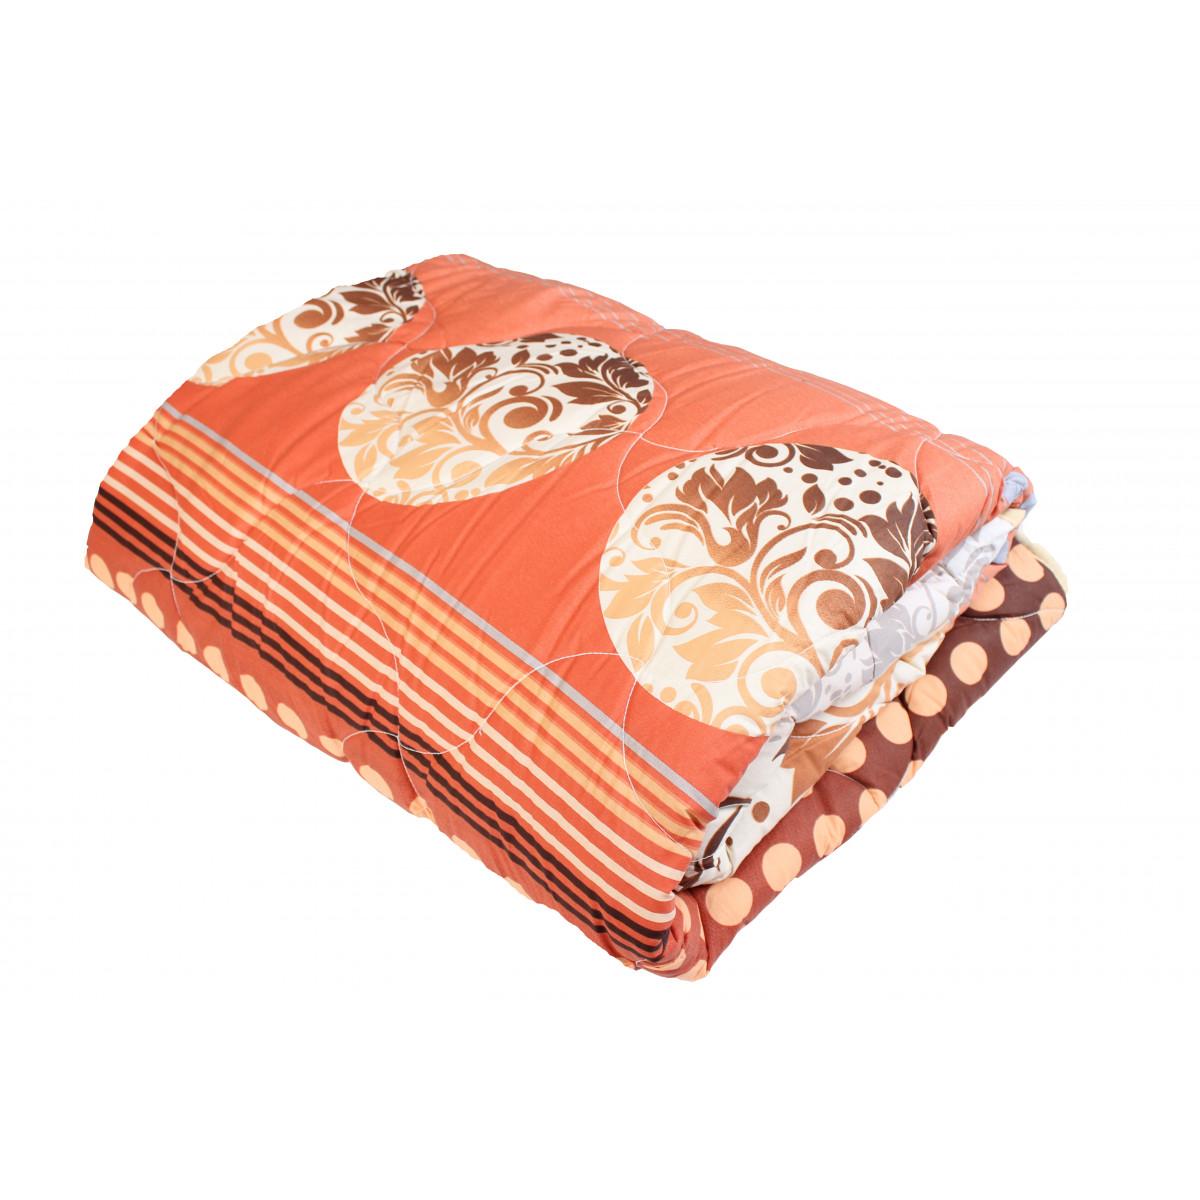 Пролетна завивка - 100% памук ранфорс - 200/210 - 150гр/м2 - Венера